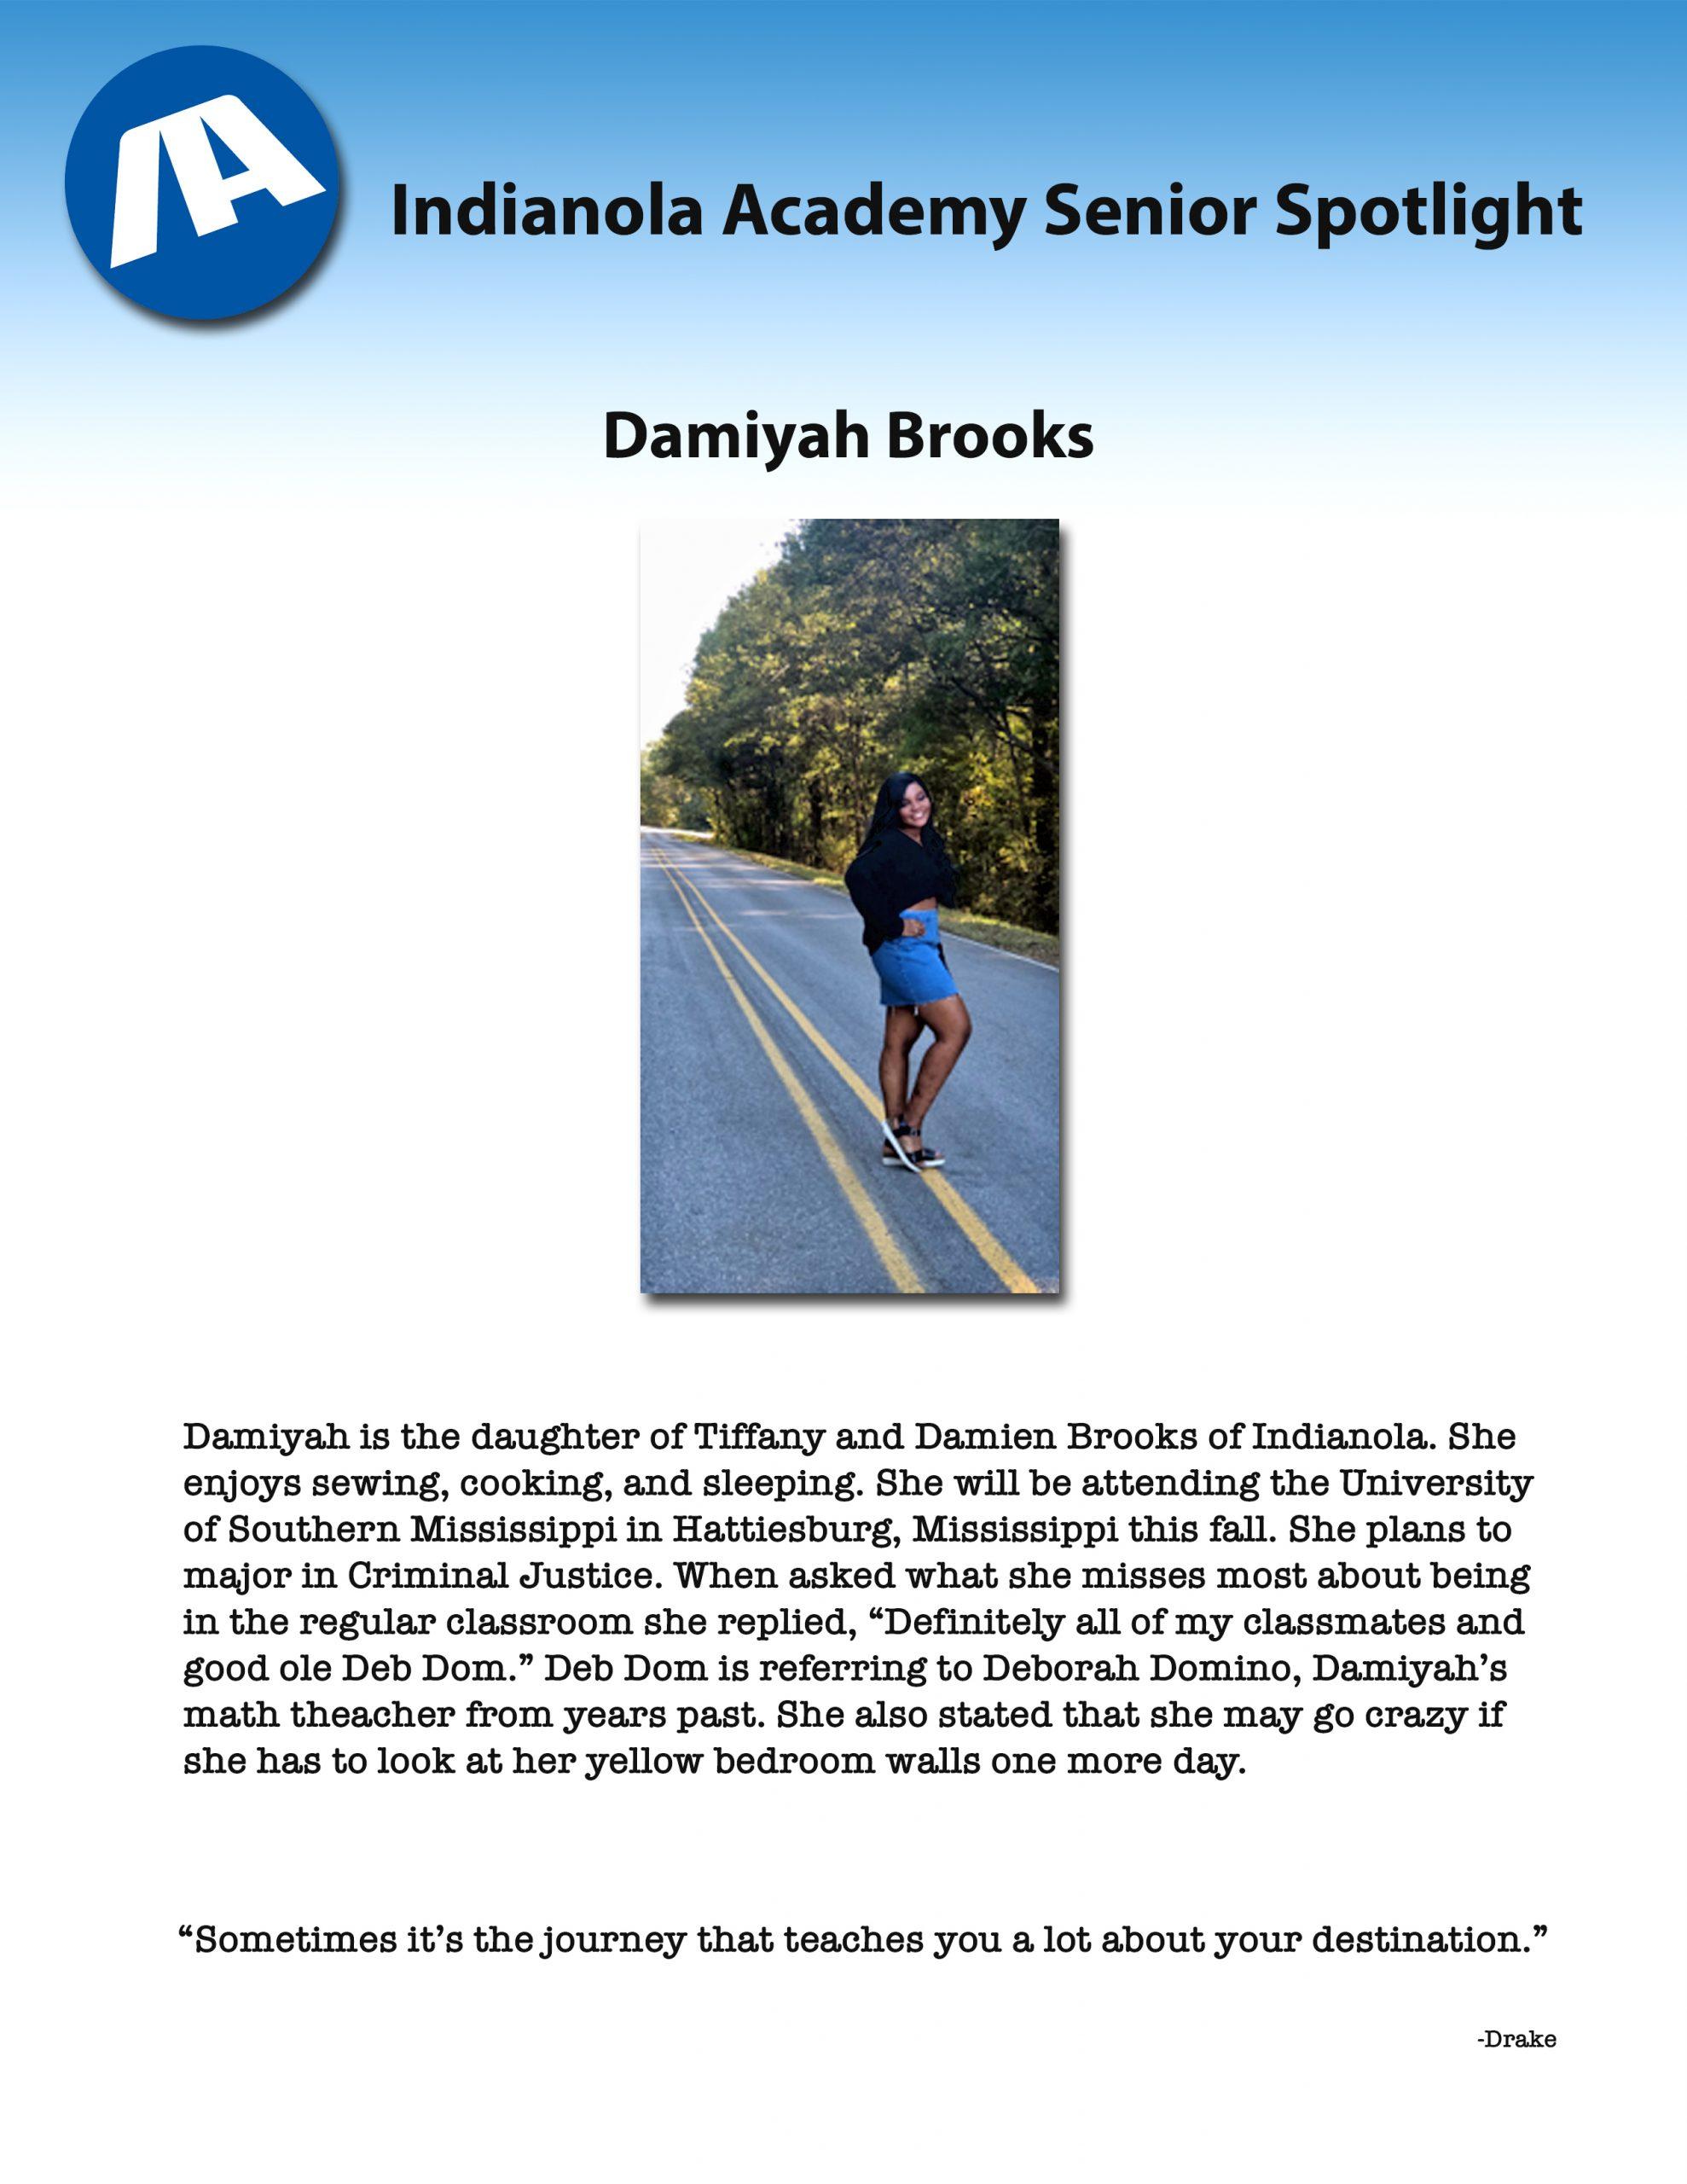 Damiyah Brooks